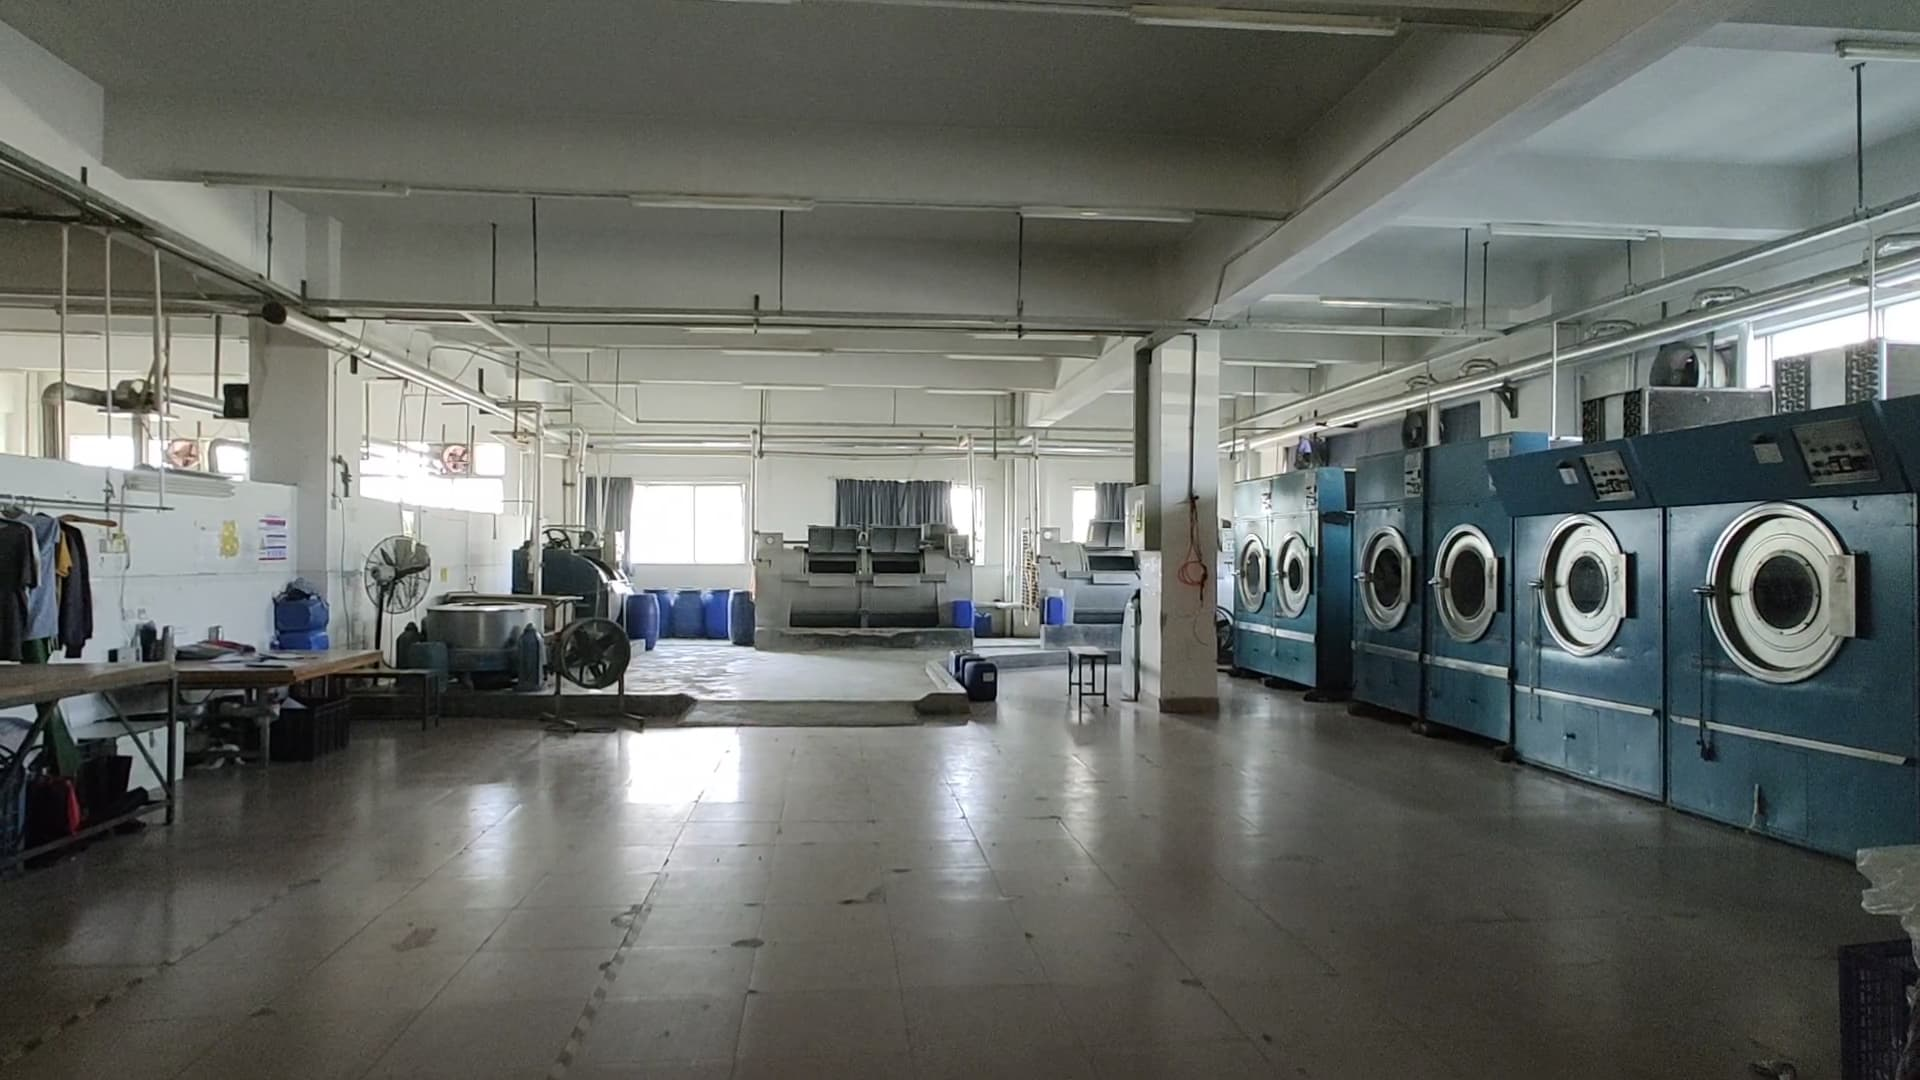 自社製品水洗い加工場